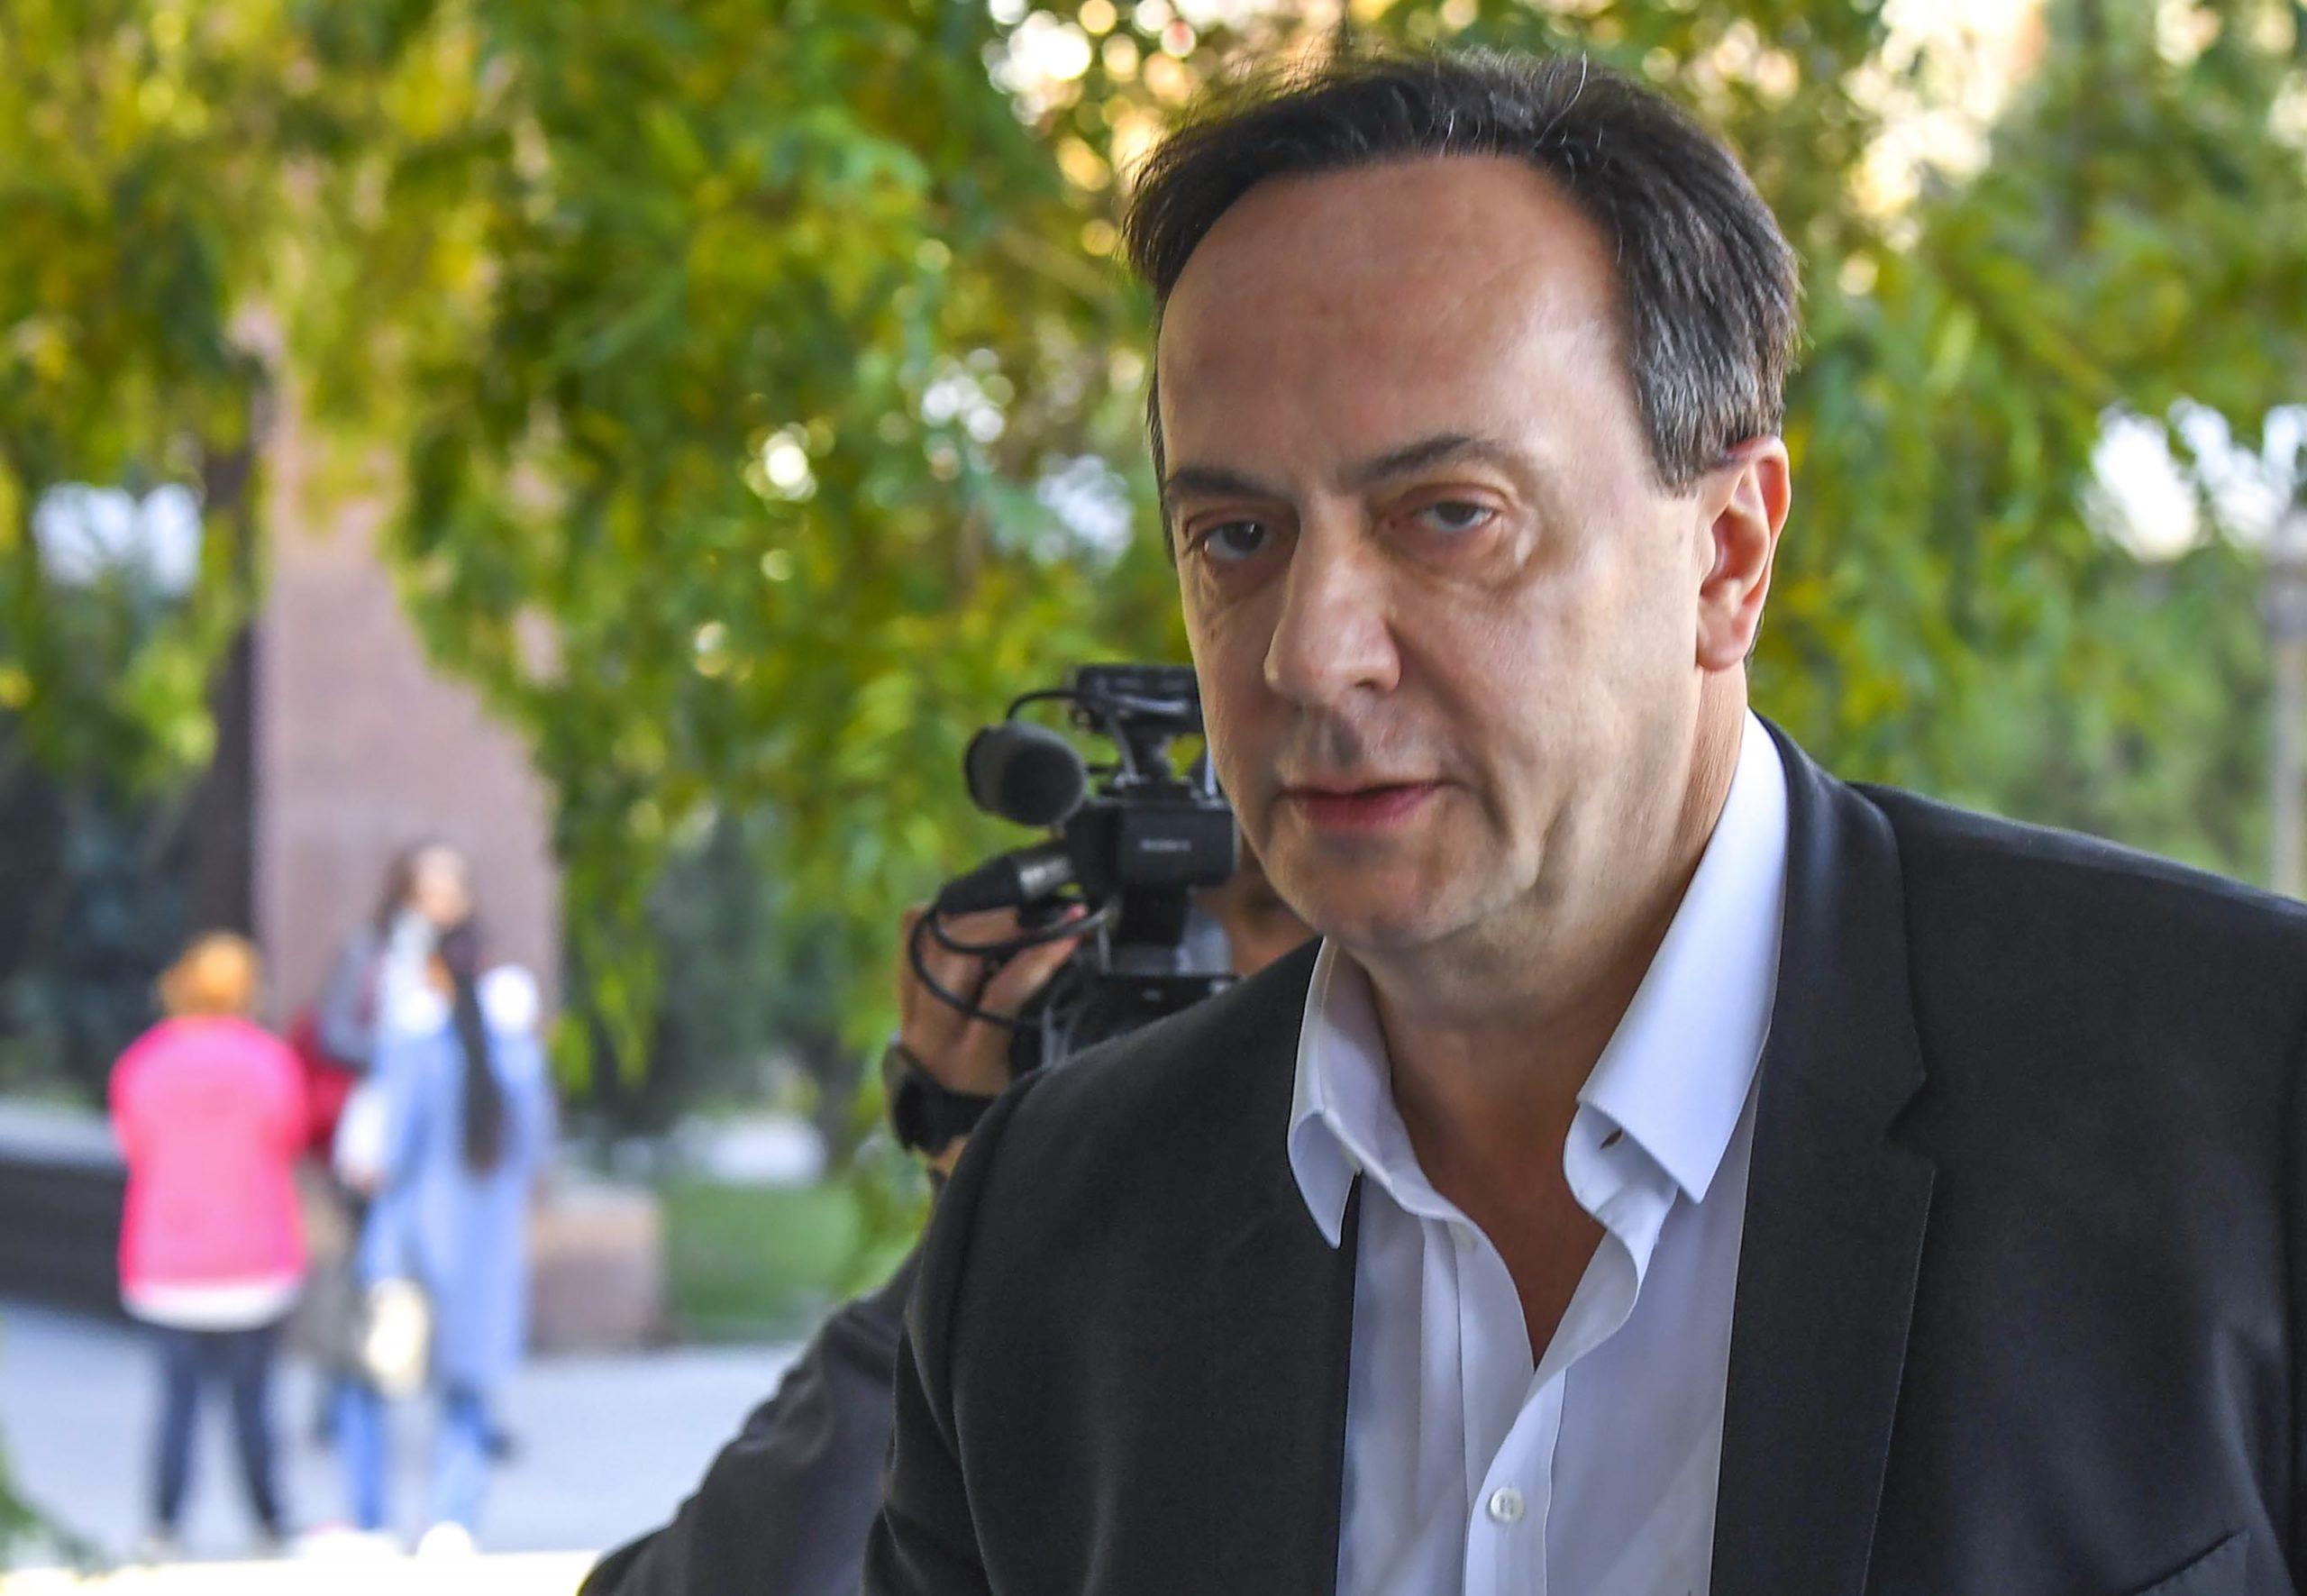 Bivši direktor Državne bezbednosti S.Makedonije u Tužilaštvu posle dva dana bekstva 2